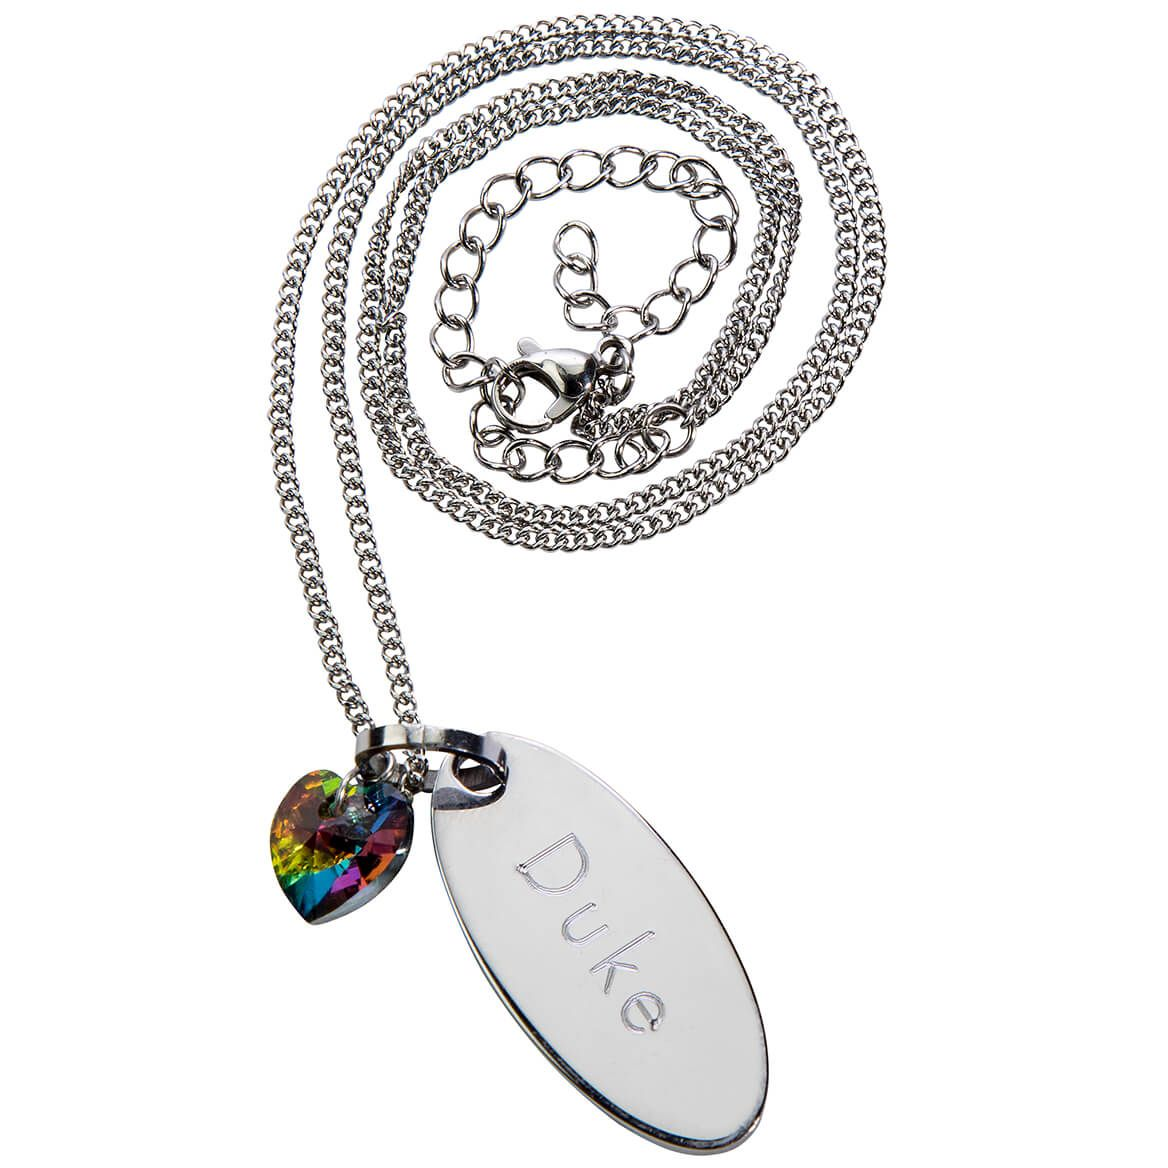 Personalized Rainbow Bridge Necklace-368480